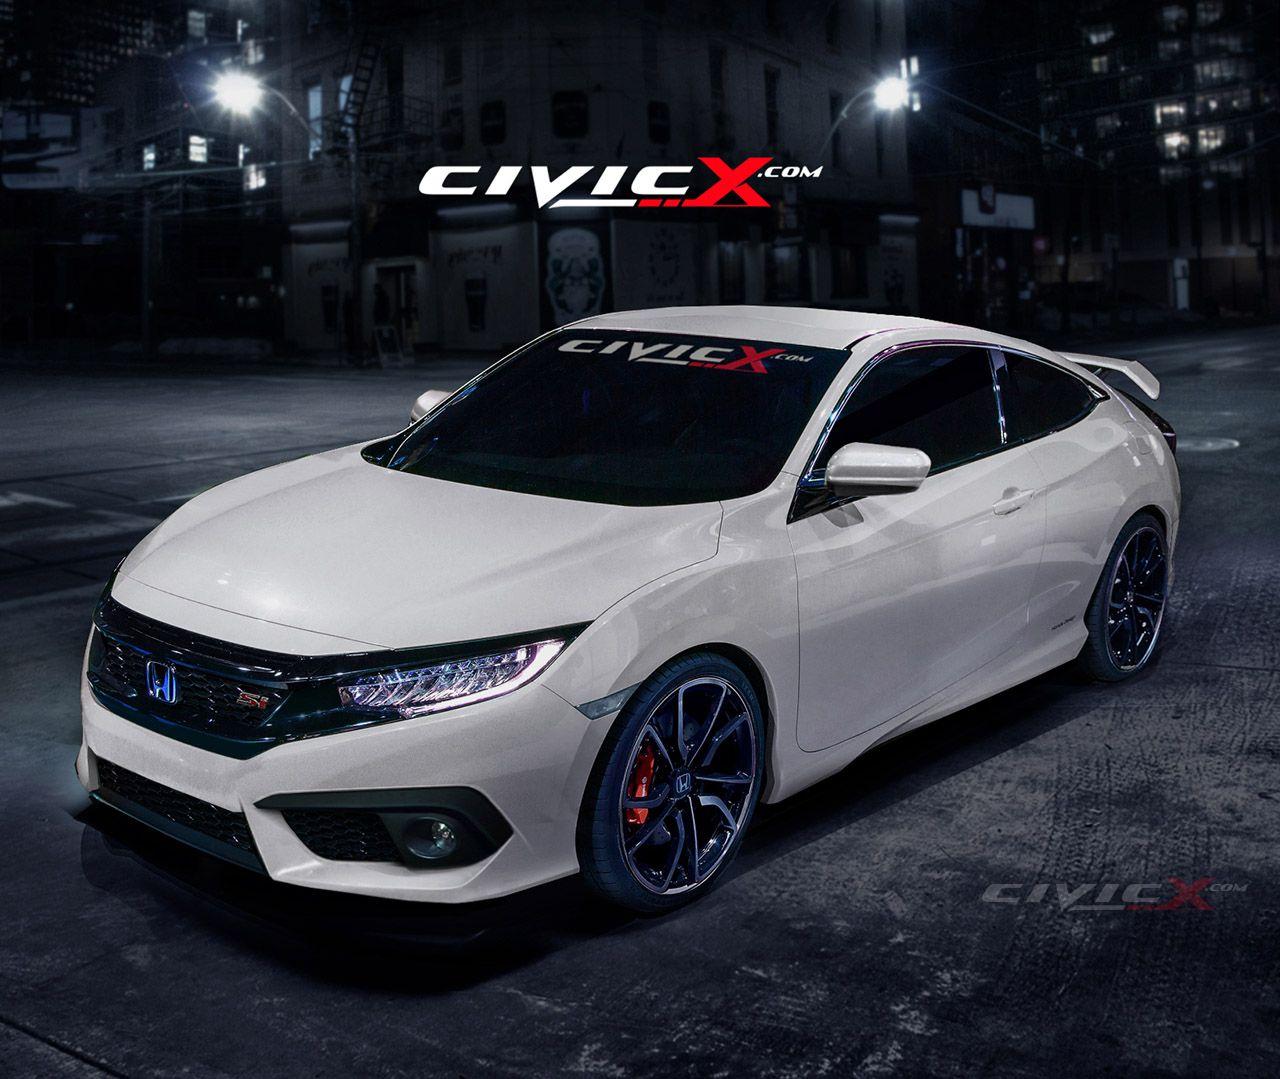 2016 Honda Civic Si (concept) Honda civic si